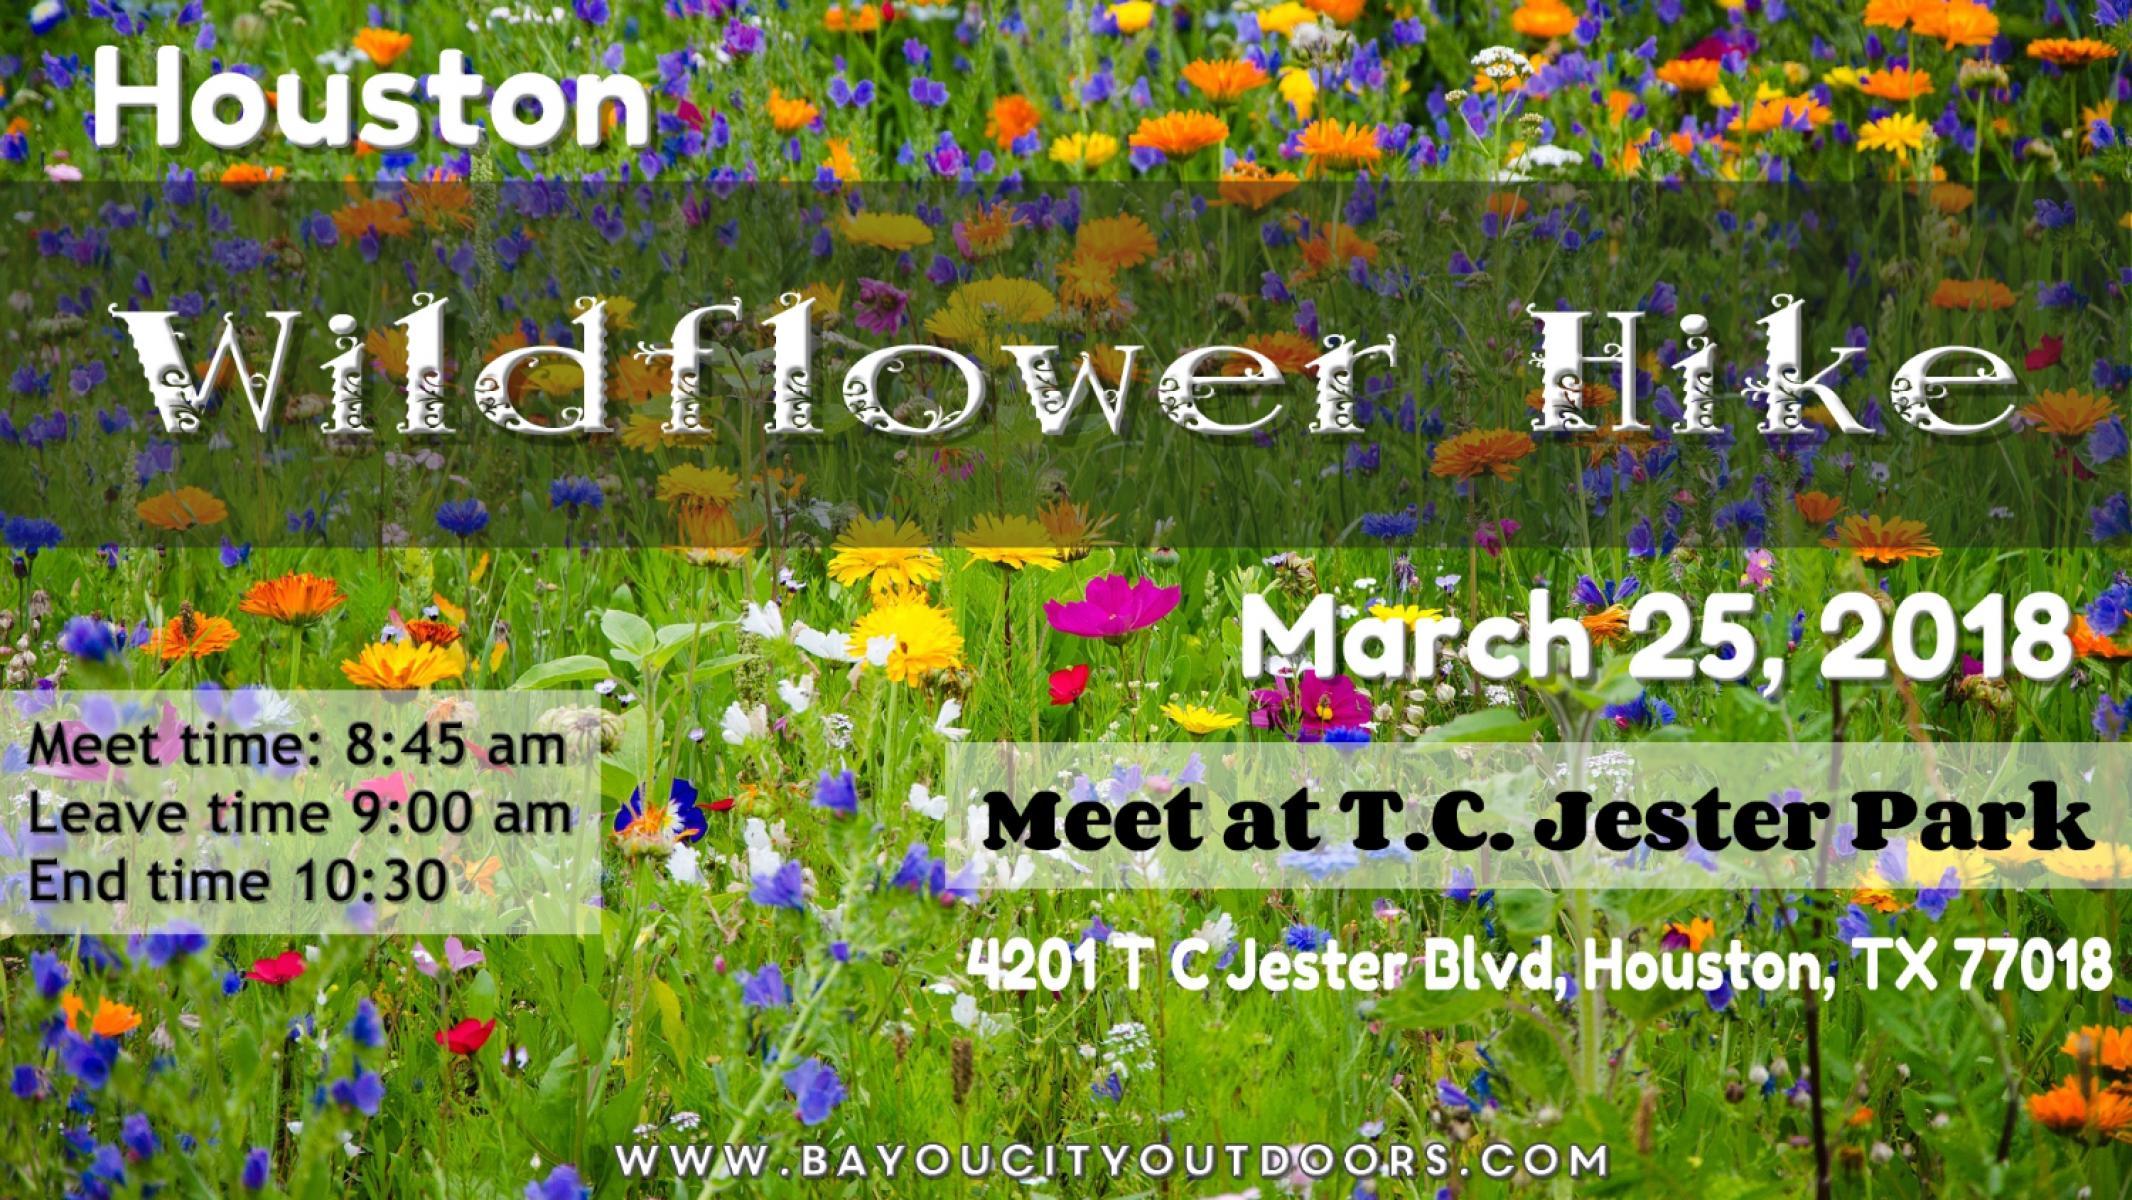 Houston Wildflower Hike